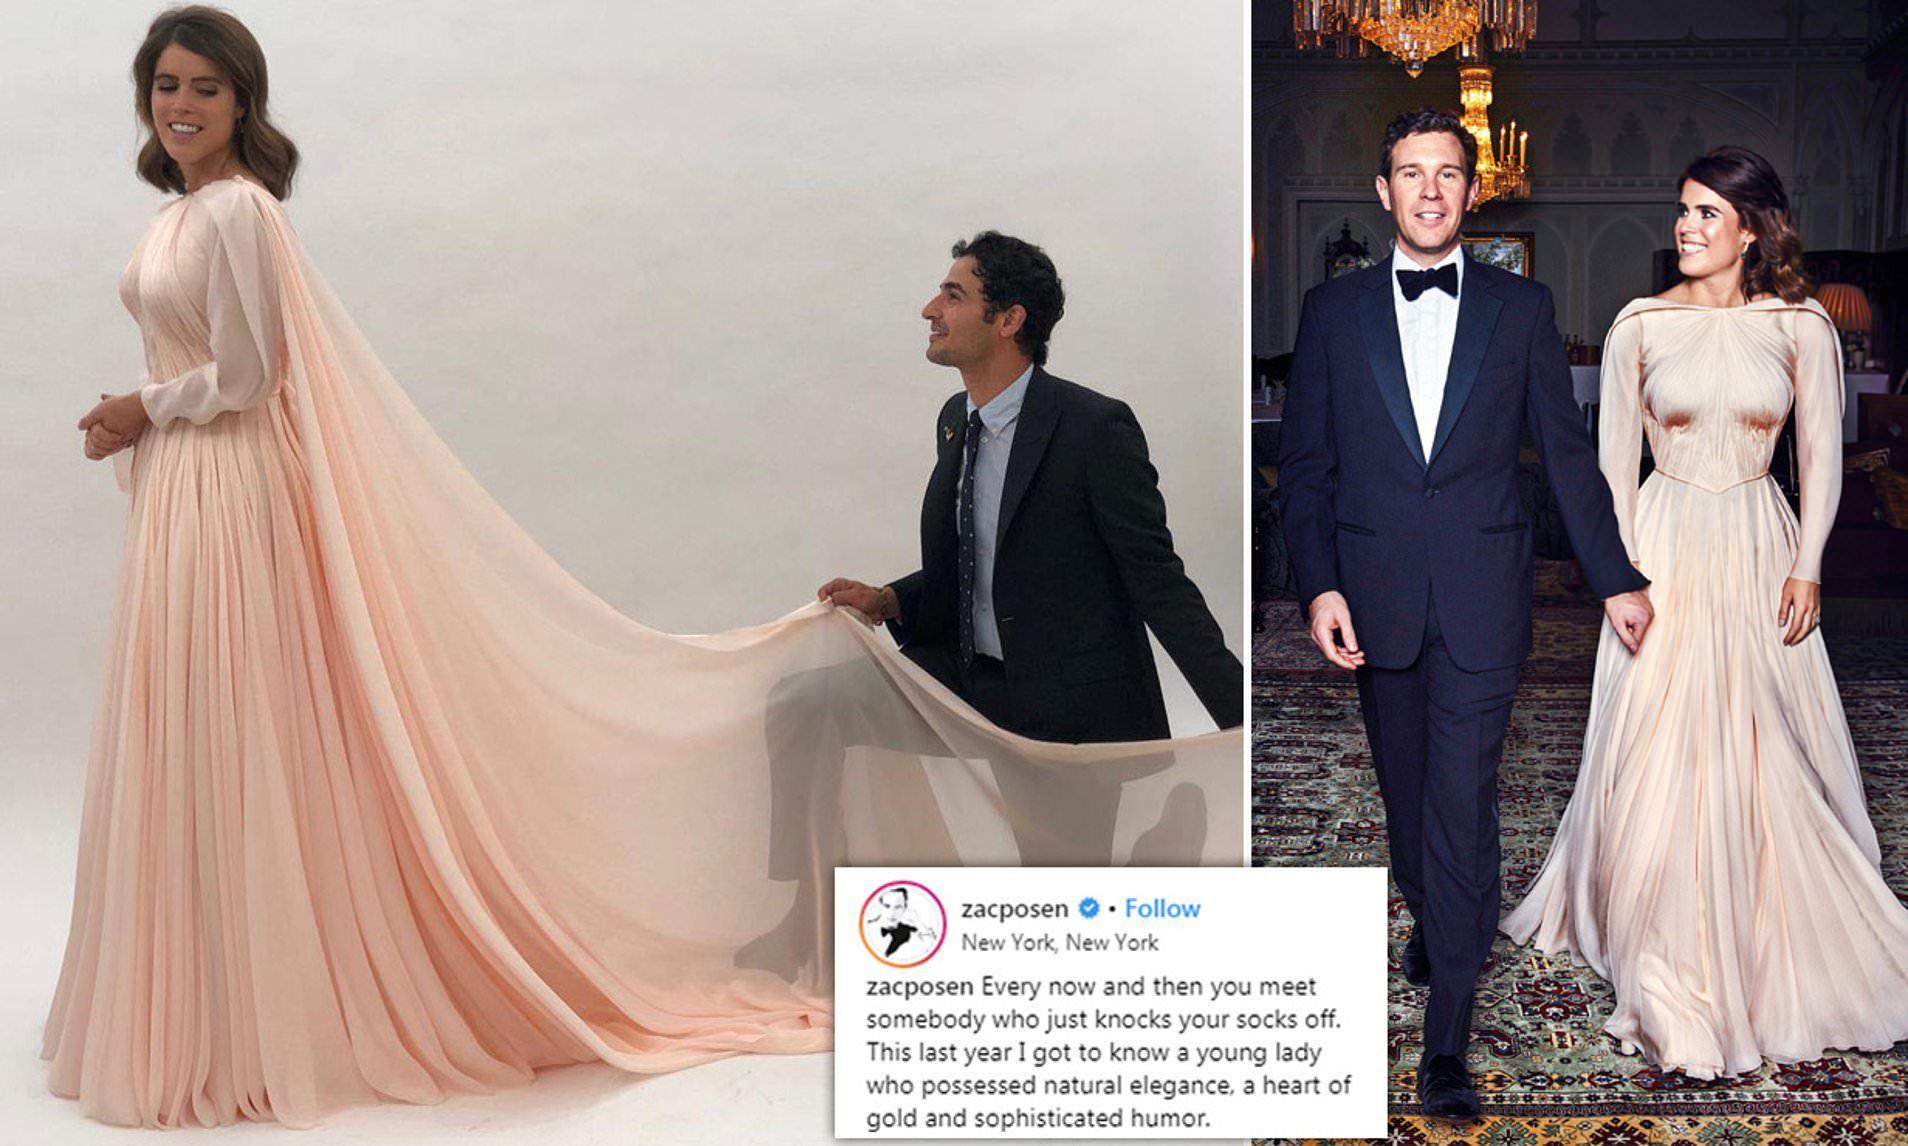 Zac Posen Shares Unseen Photo Of Princess Eugenie S Wedding Dress